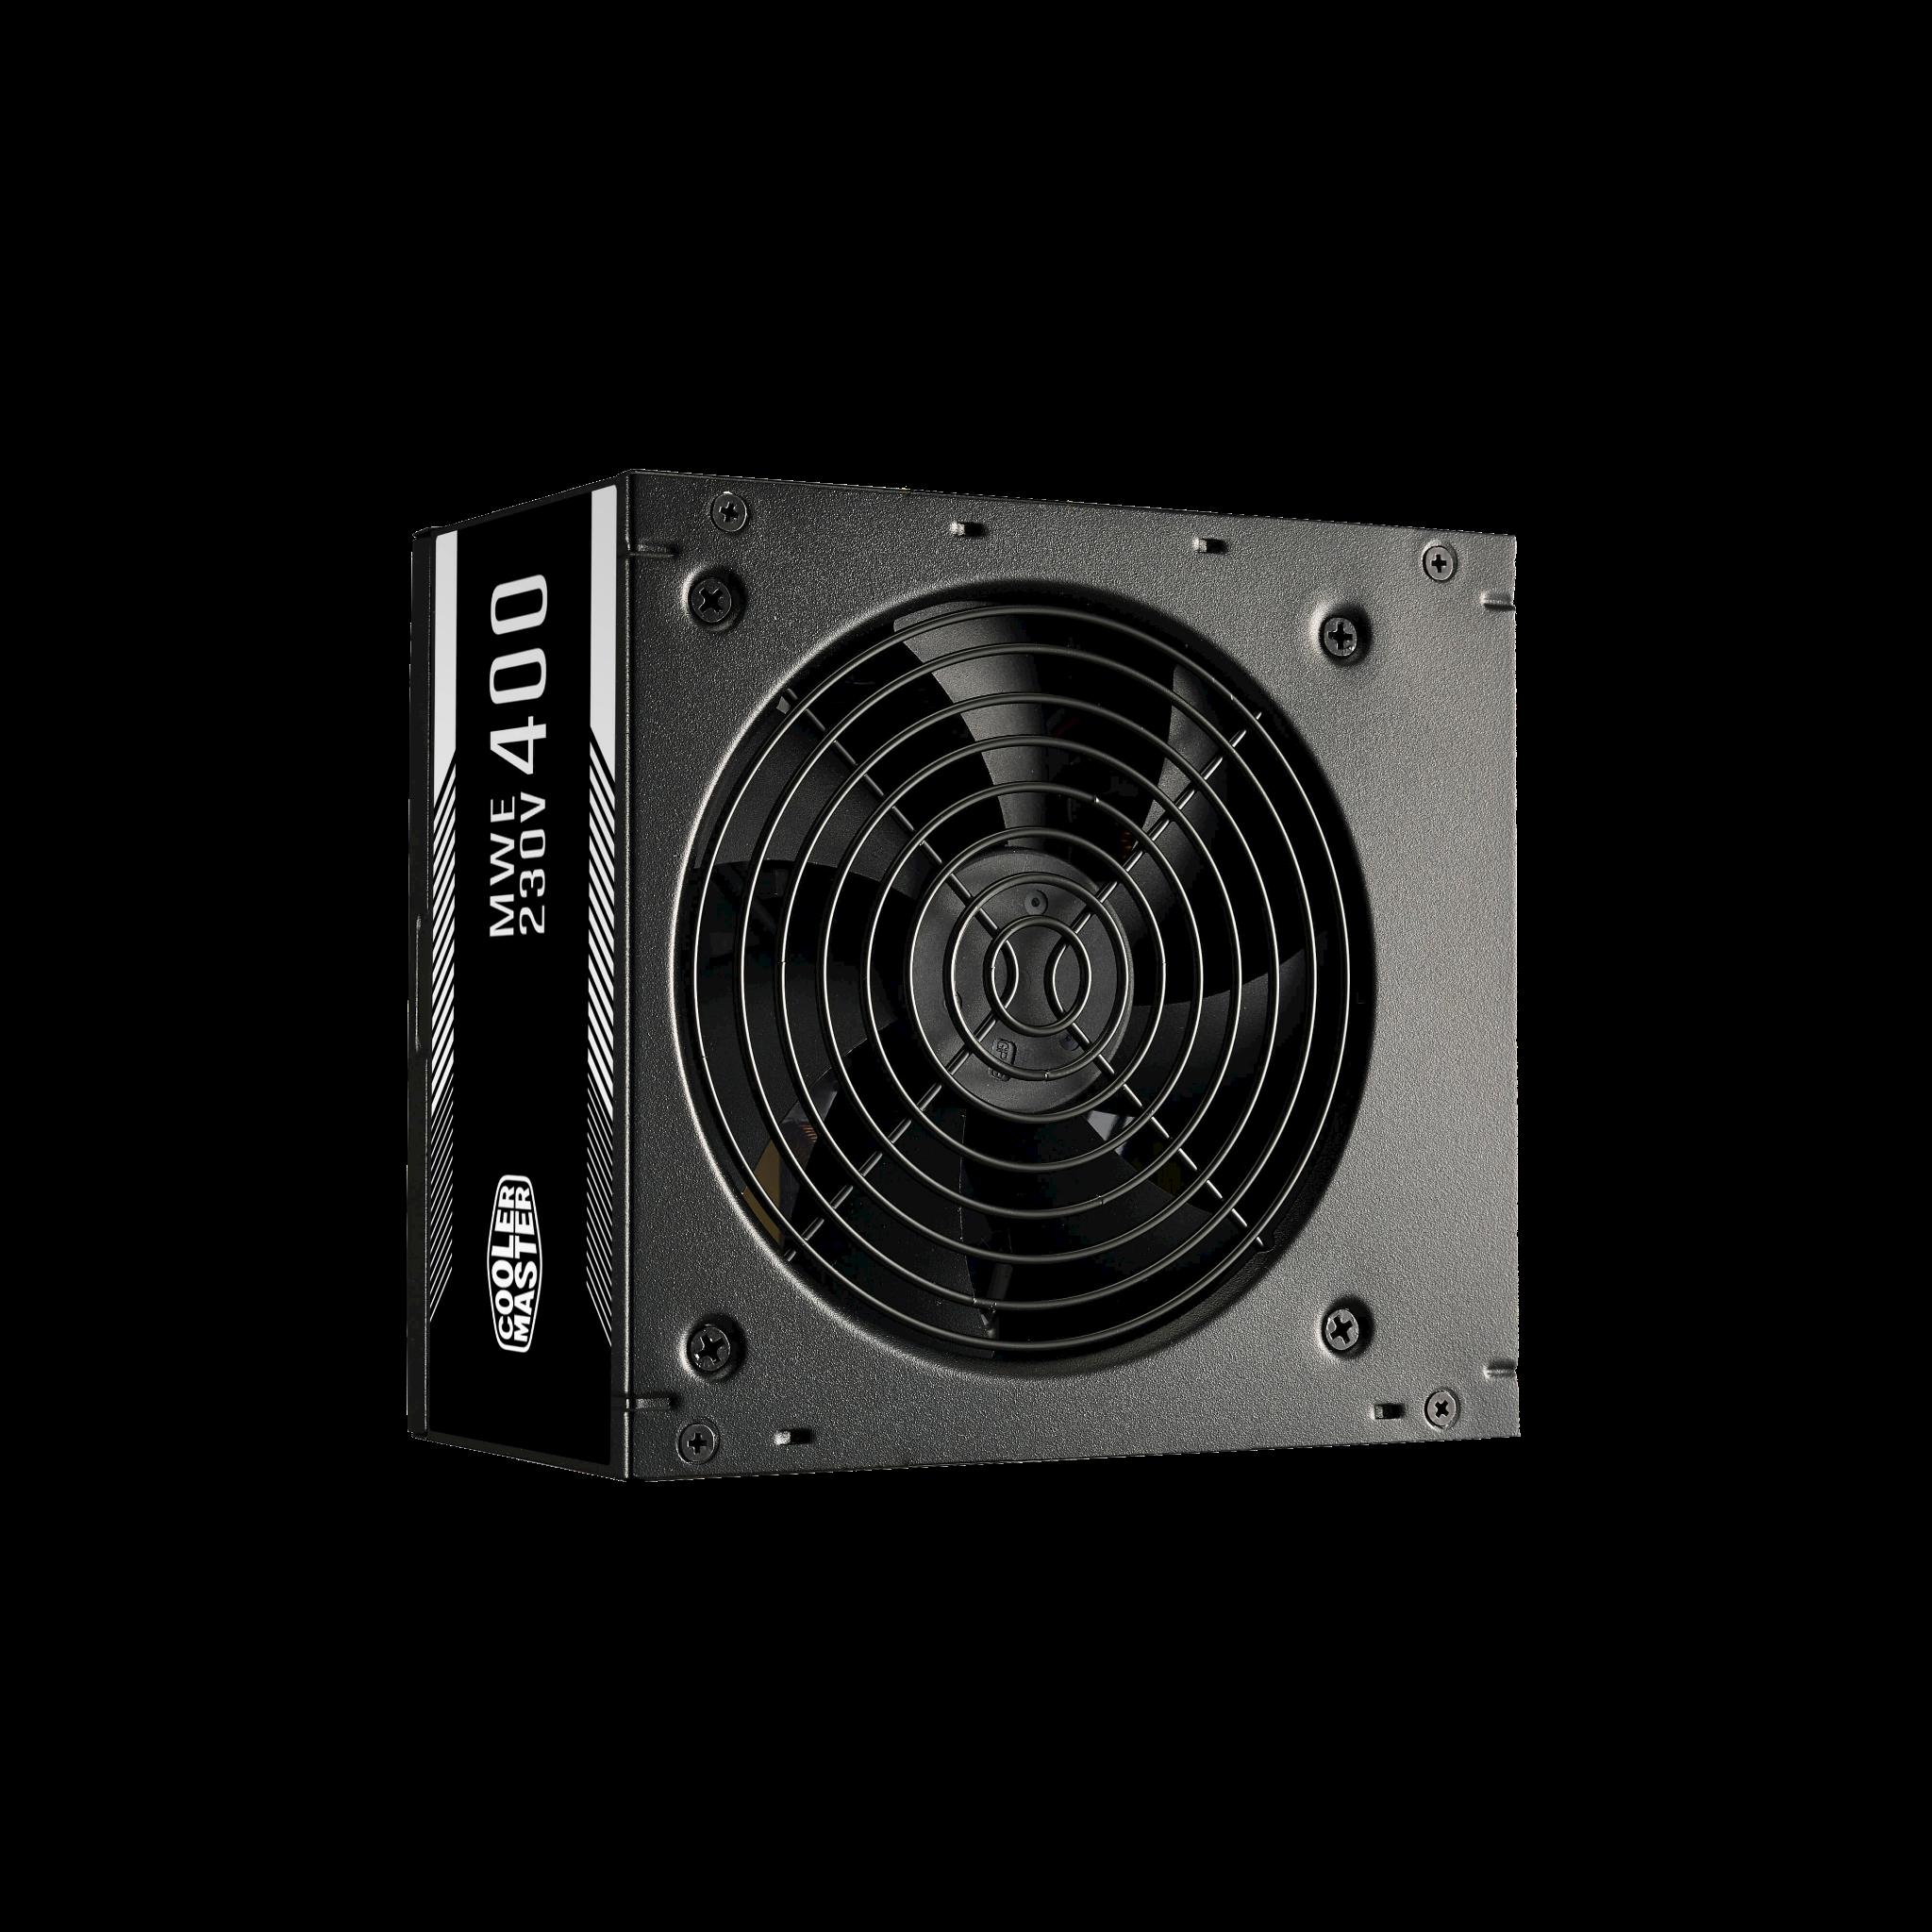 Nguồn máy tính Cooler Master MWE 400 80Plus